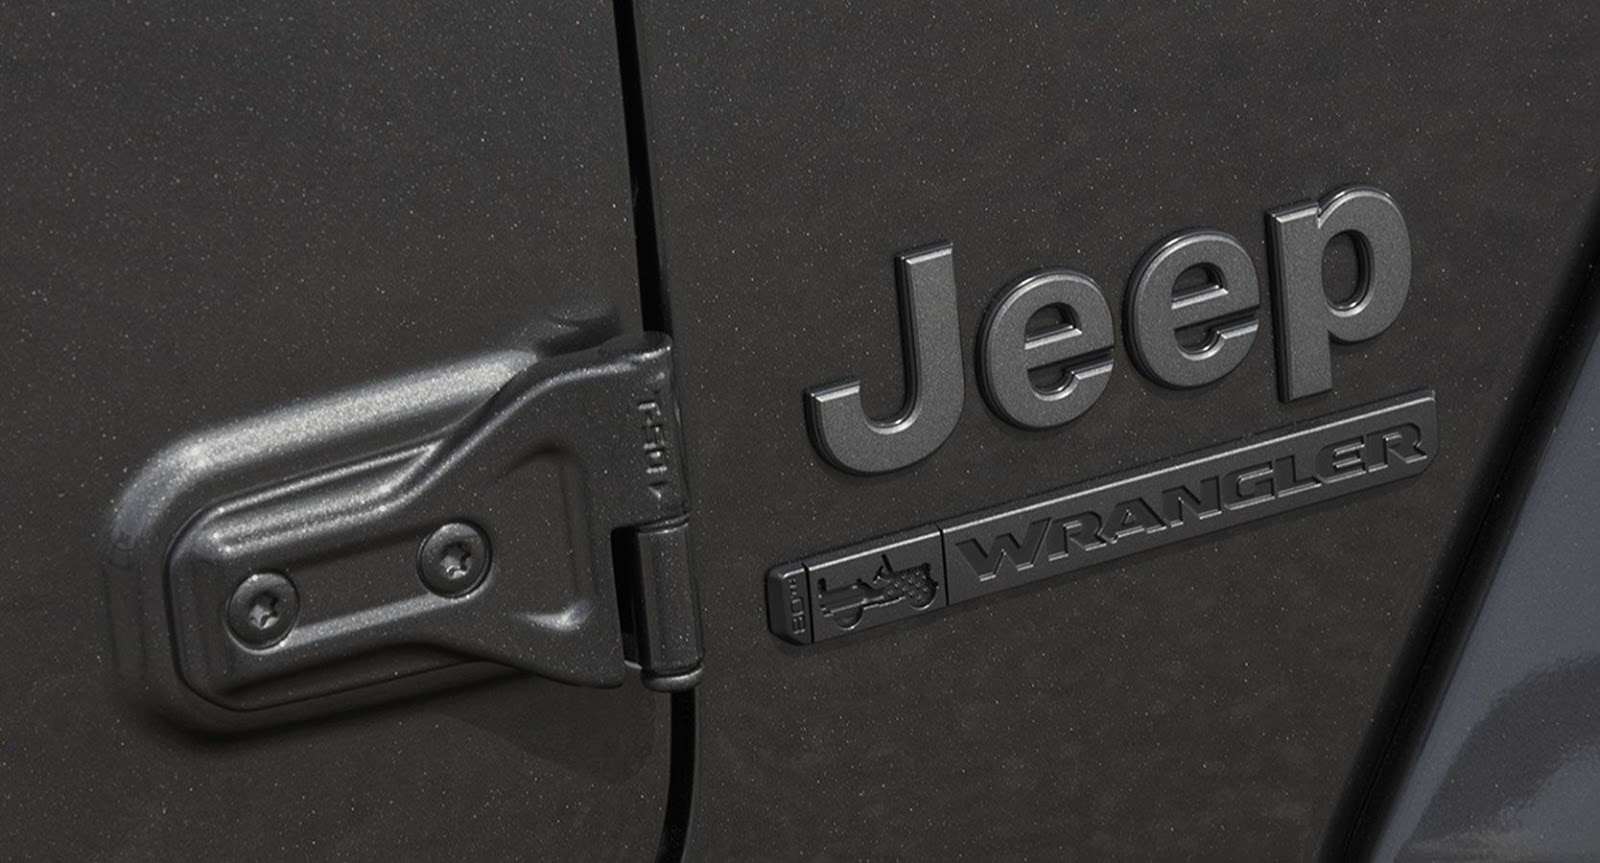 unnamed Η Jeep® γιορτάζει την 80η Επέτειο της με μια σειρά ειδικών εκδόσεων